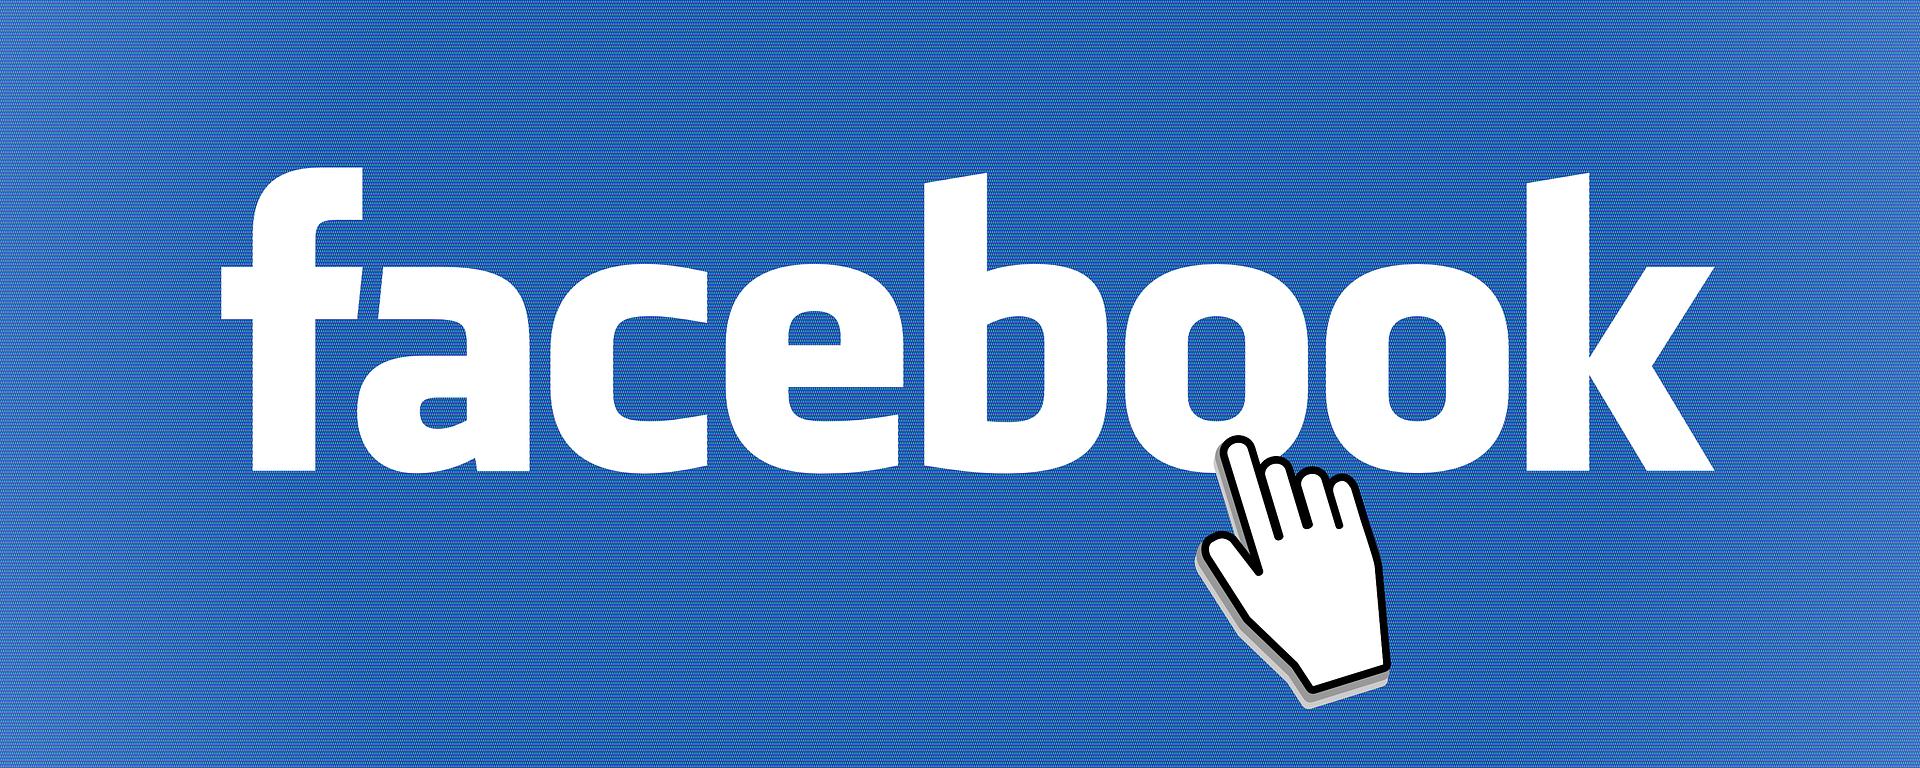 Facebook: l'inaffidabilità del gigante